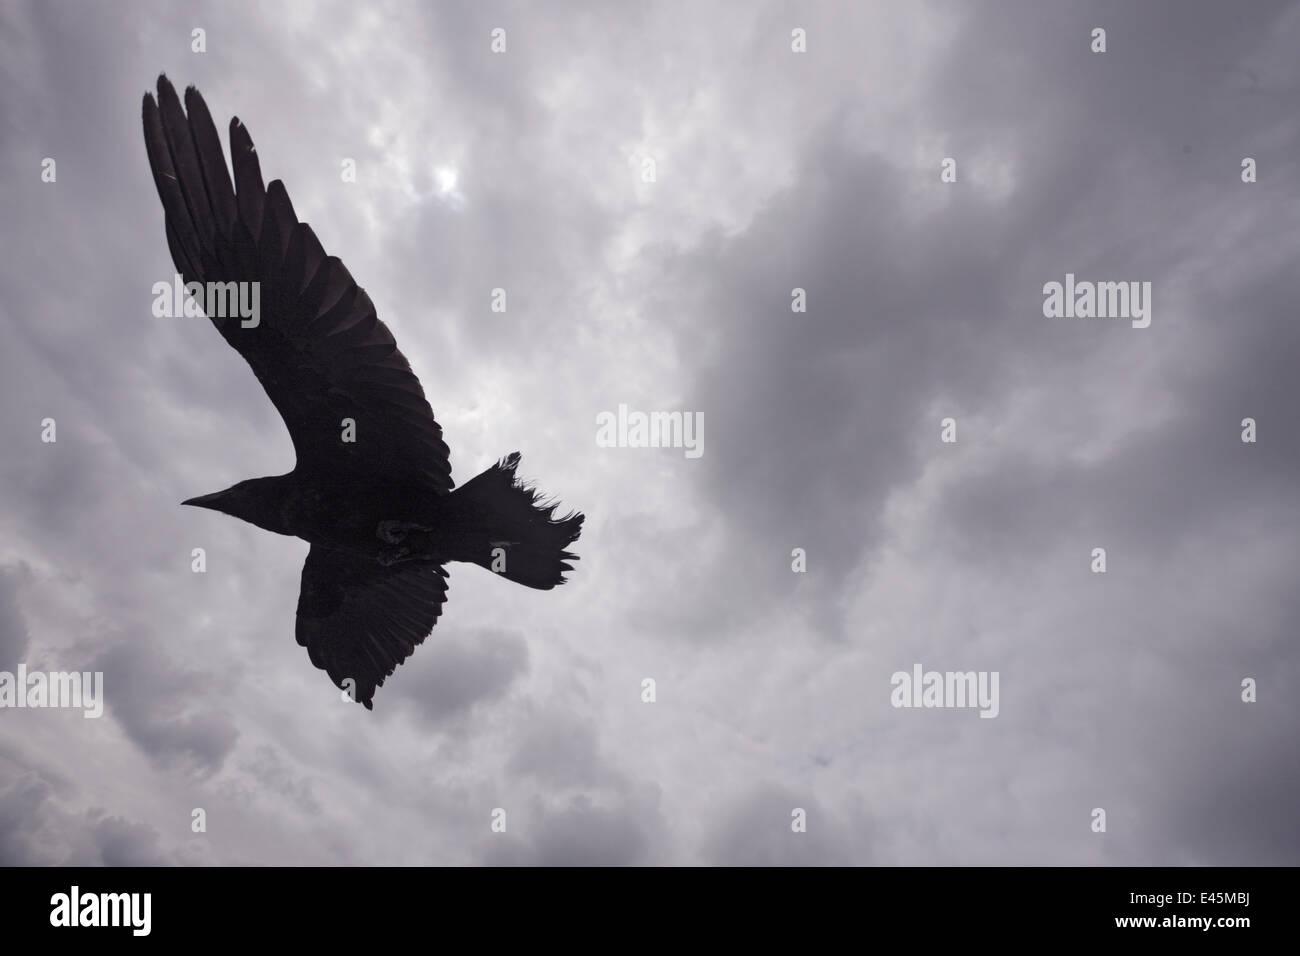 Raven Sie (Corvus Corax) im Flug, Silhouette, Burren, County Clare, Irland, Juni 2009 Stockbild